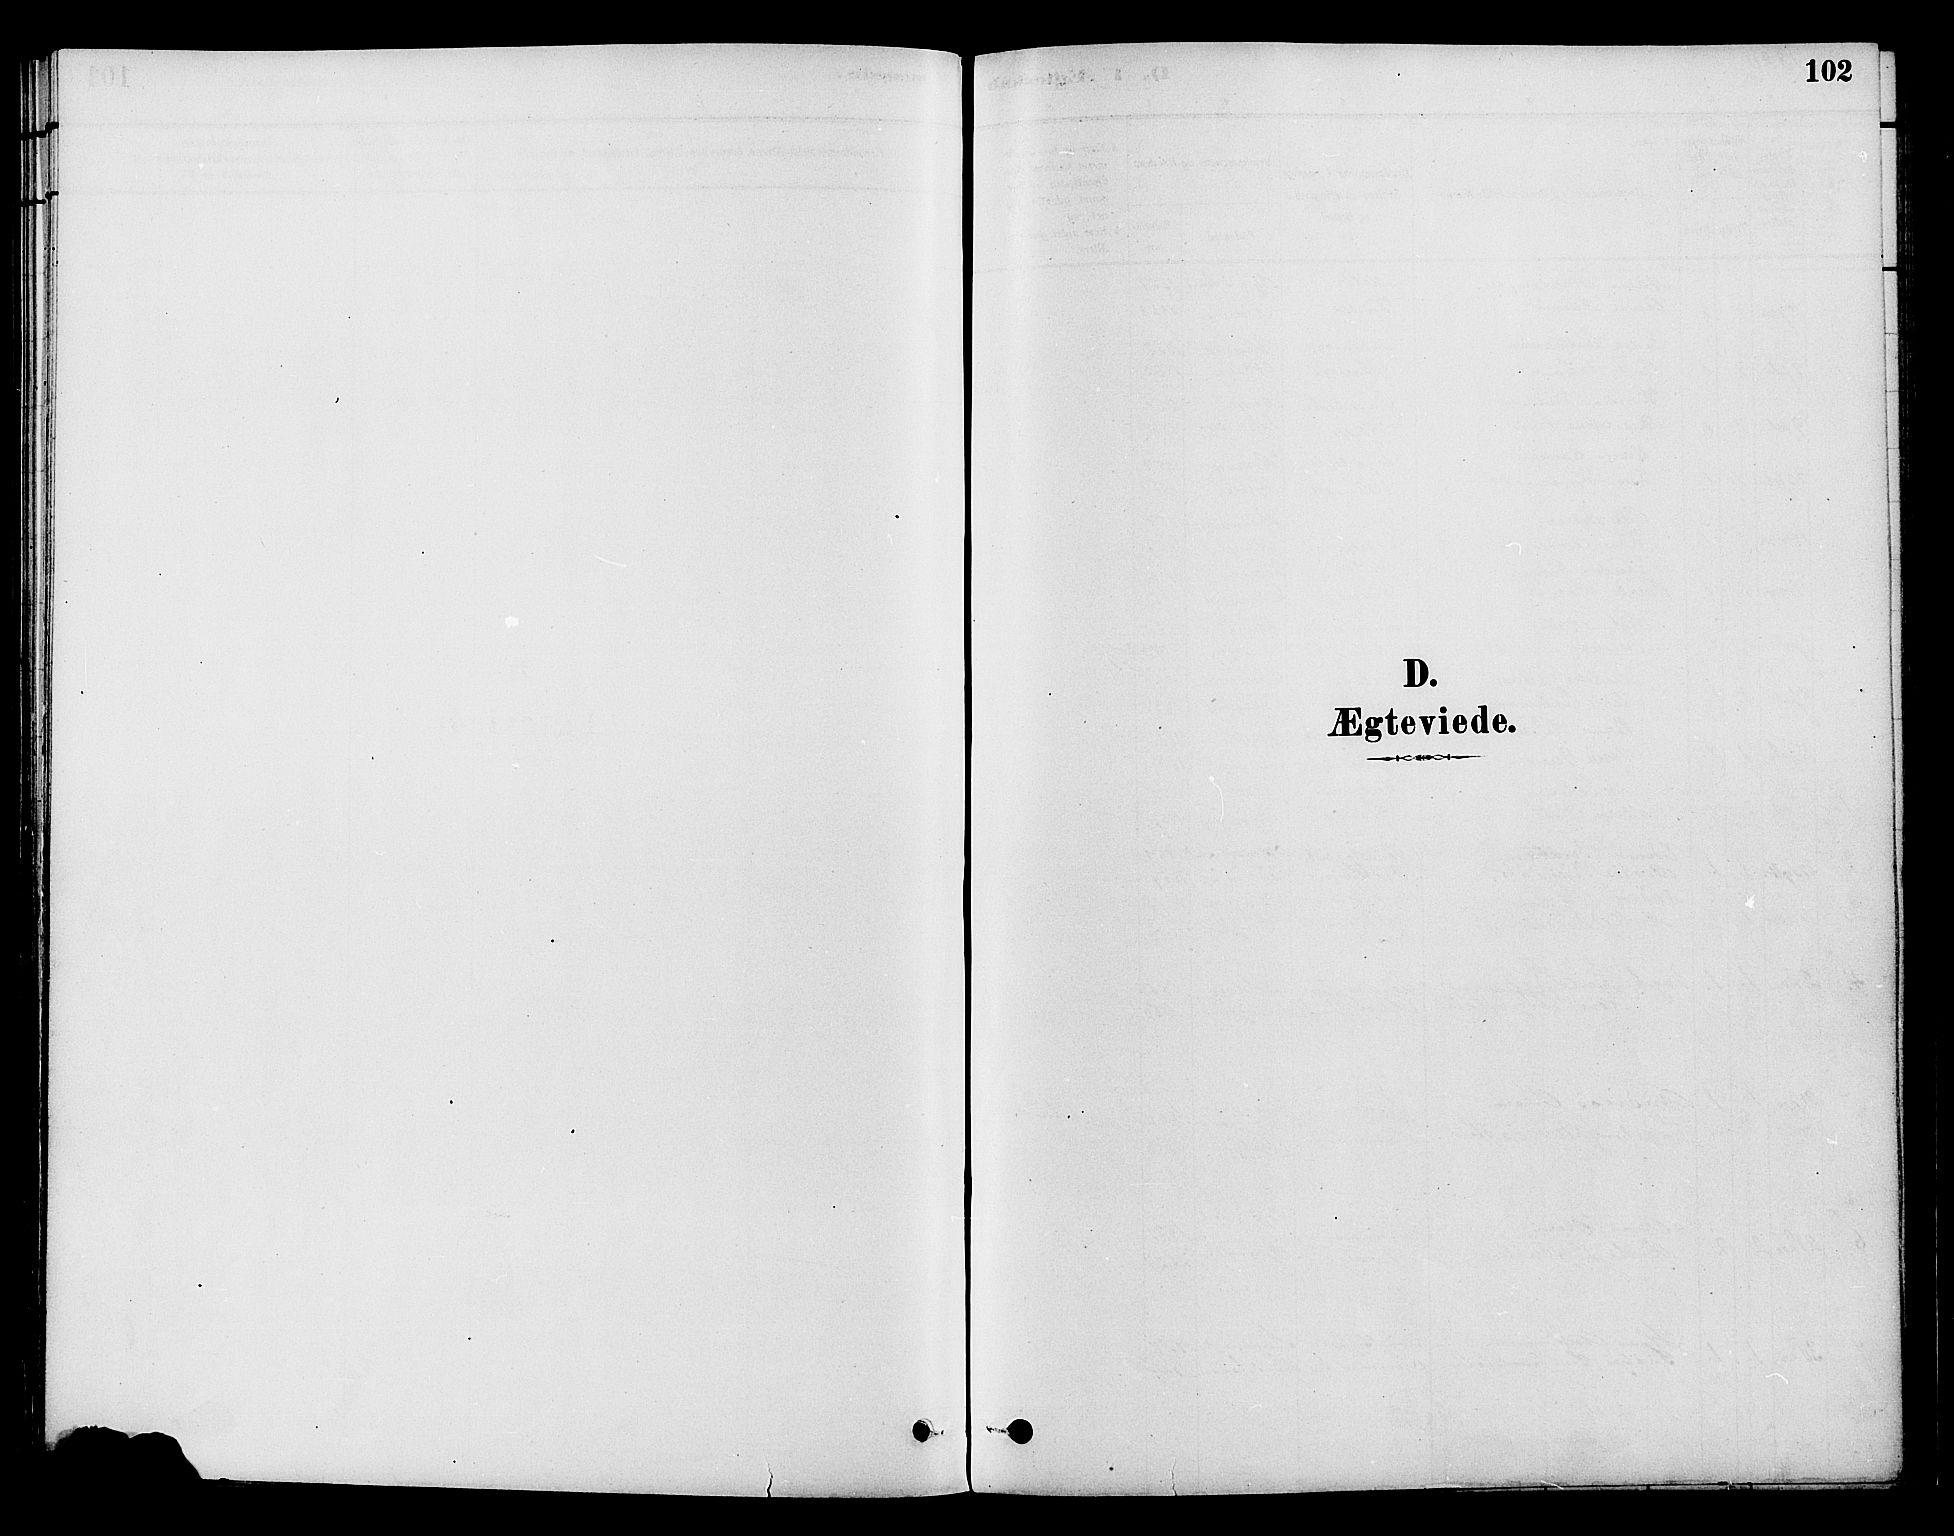 SAH, Gran prestekontor, Ministerialbok nr. 15, 1880-1888, s. 102